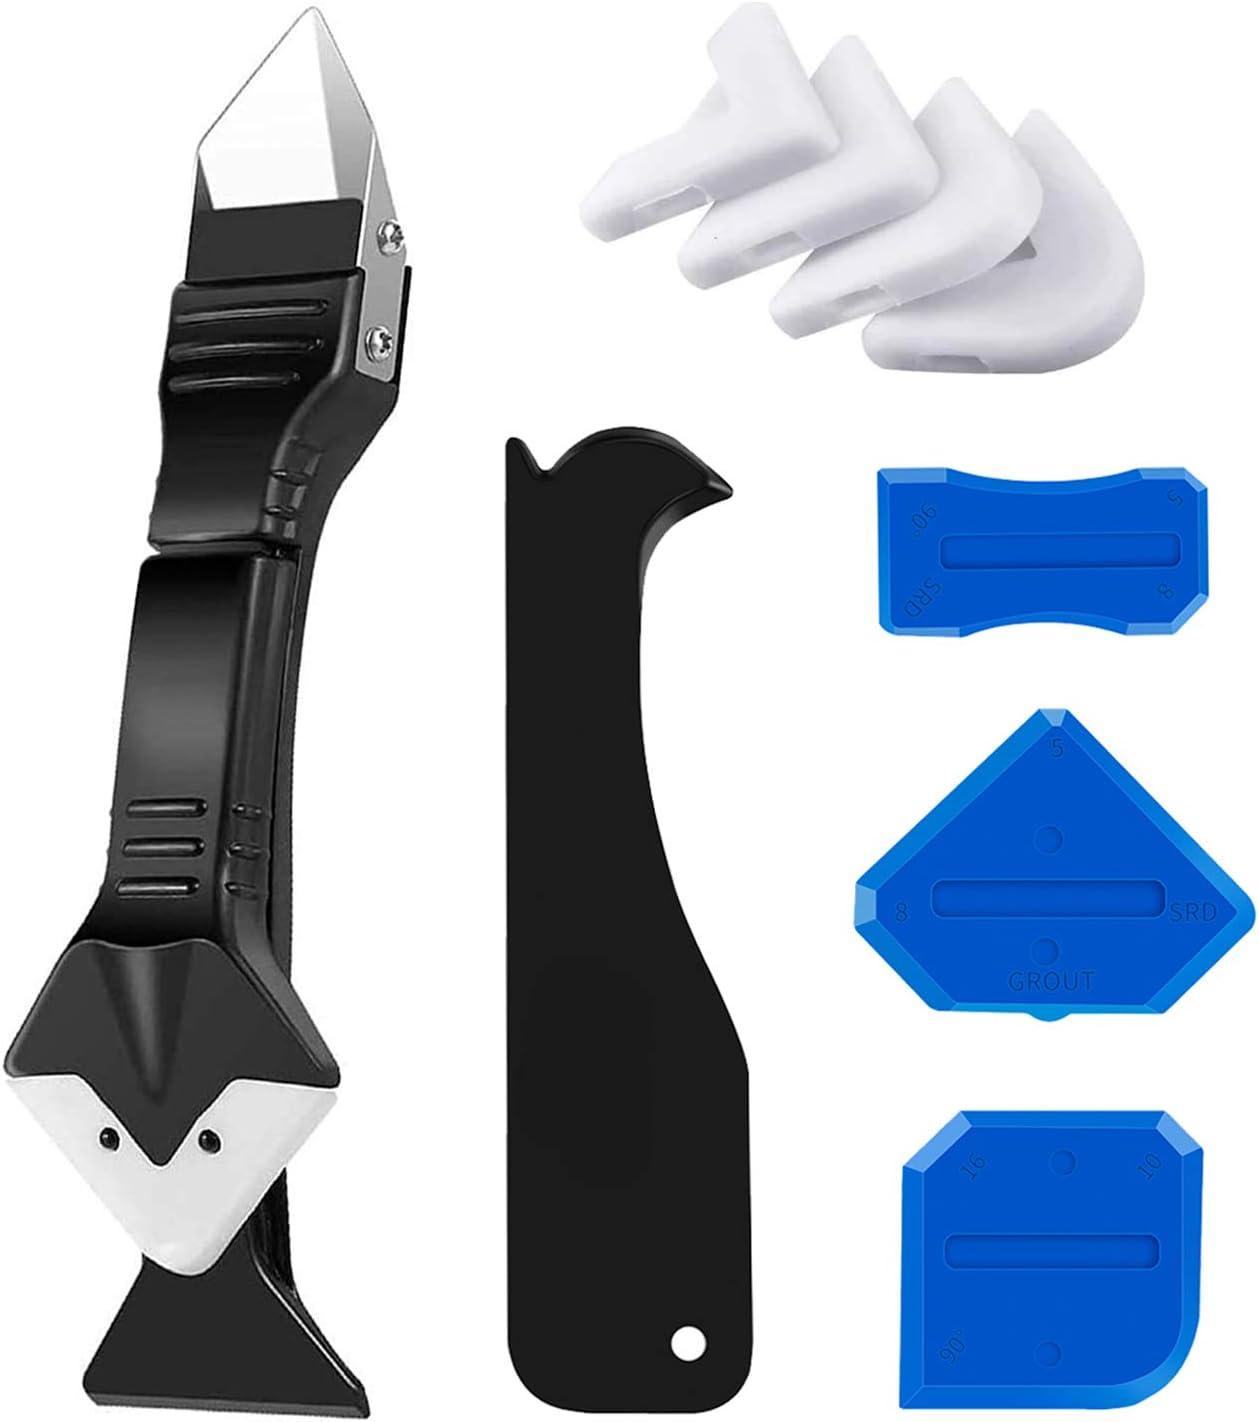 Color : 201 Stainless Steel, Size : M3 20pcs QINGRUI Tools for reparing 5-10pcs Schmetterlingsfl/ügelmuttern M3 M4 M5 M6 M8 M10 M12 Edelstahl Fl/ügelmuttern verzinkt Hand anziehen Mutter Easy to use.